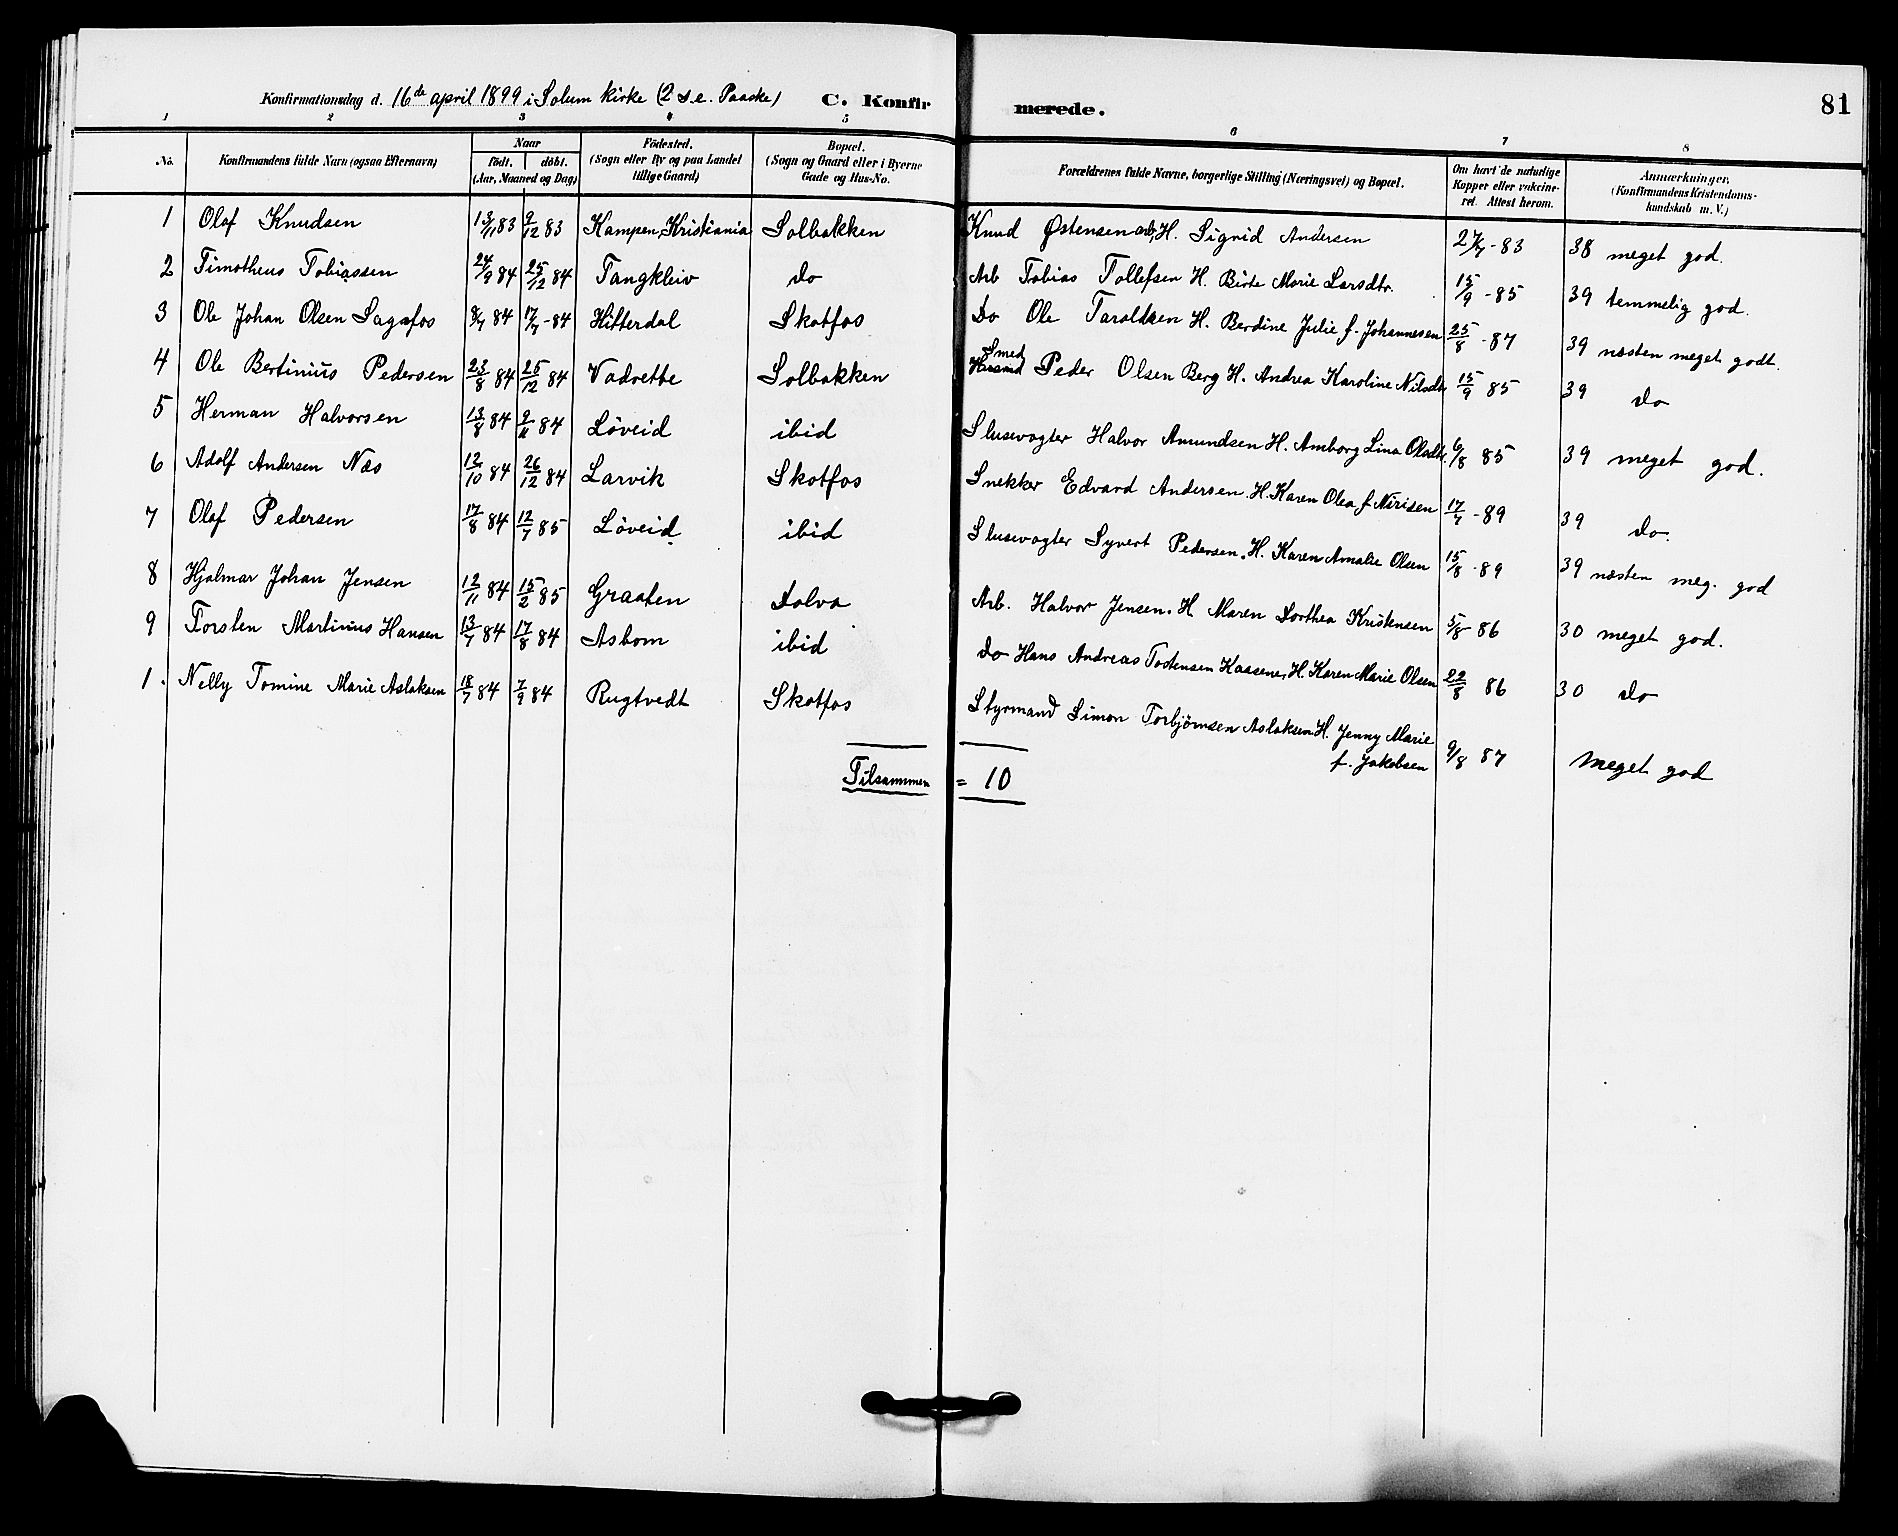 SAKO, Solum kirkebøker, G/Gb/L0004: Klokkerbok nr. II 4, 1898-1905, s. 81